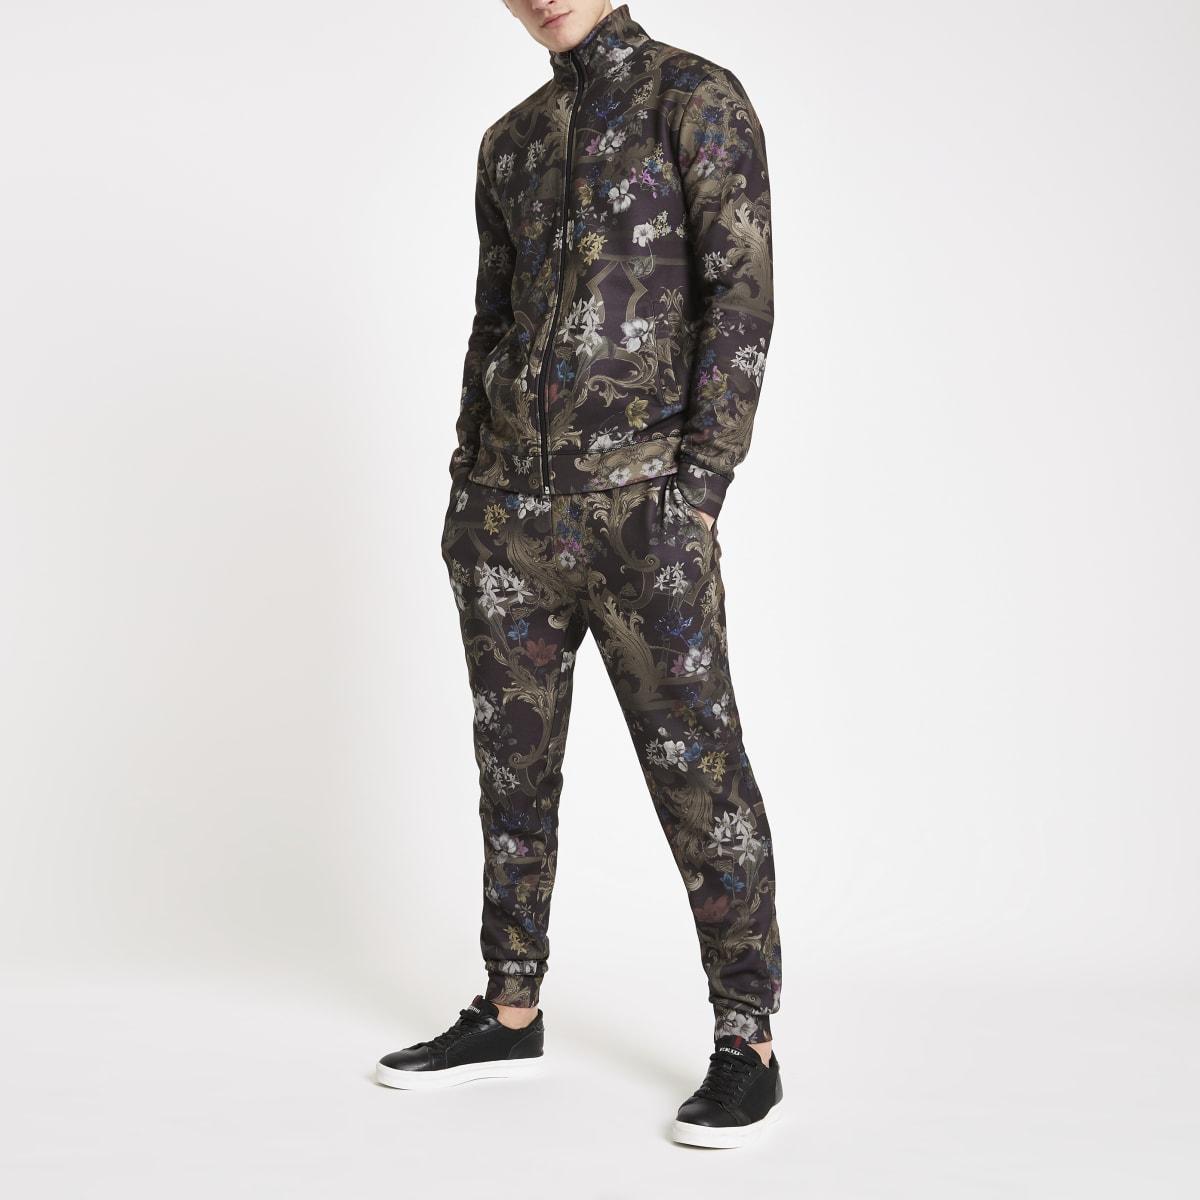 Black baroque print slim fit joggers